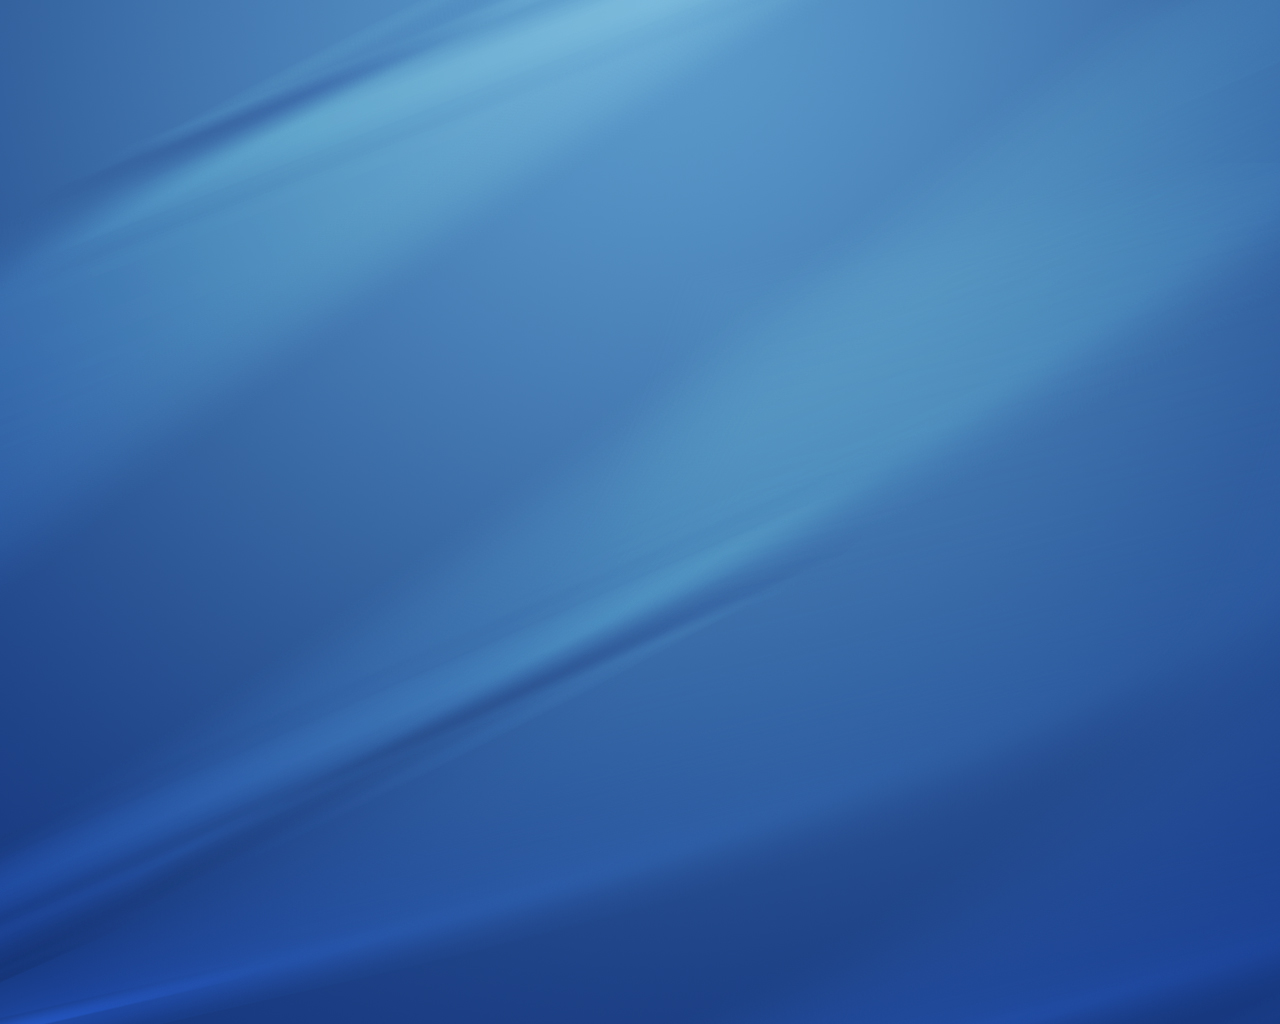 bc6_blue